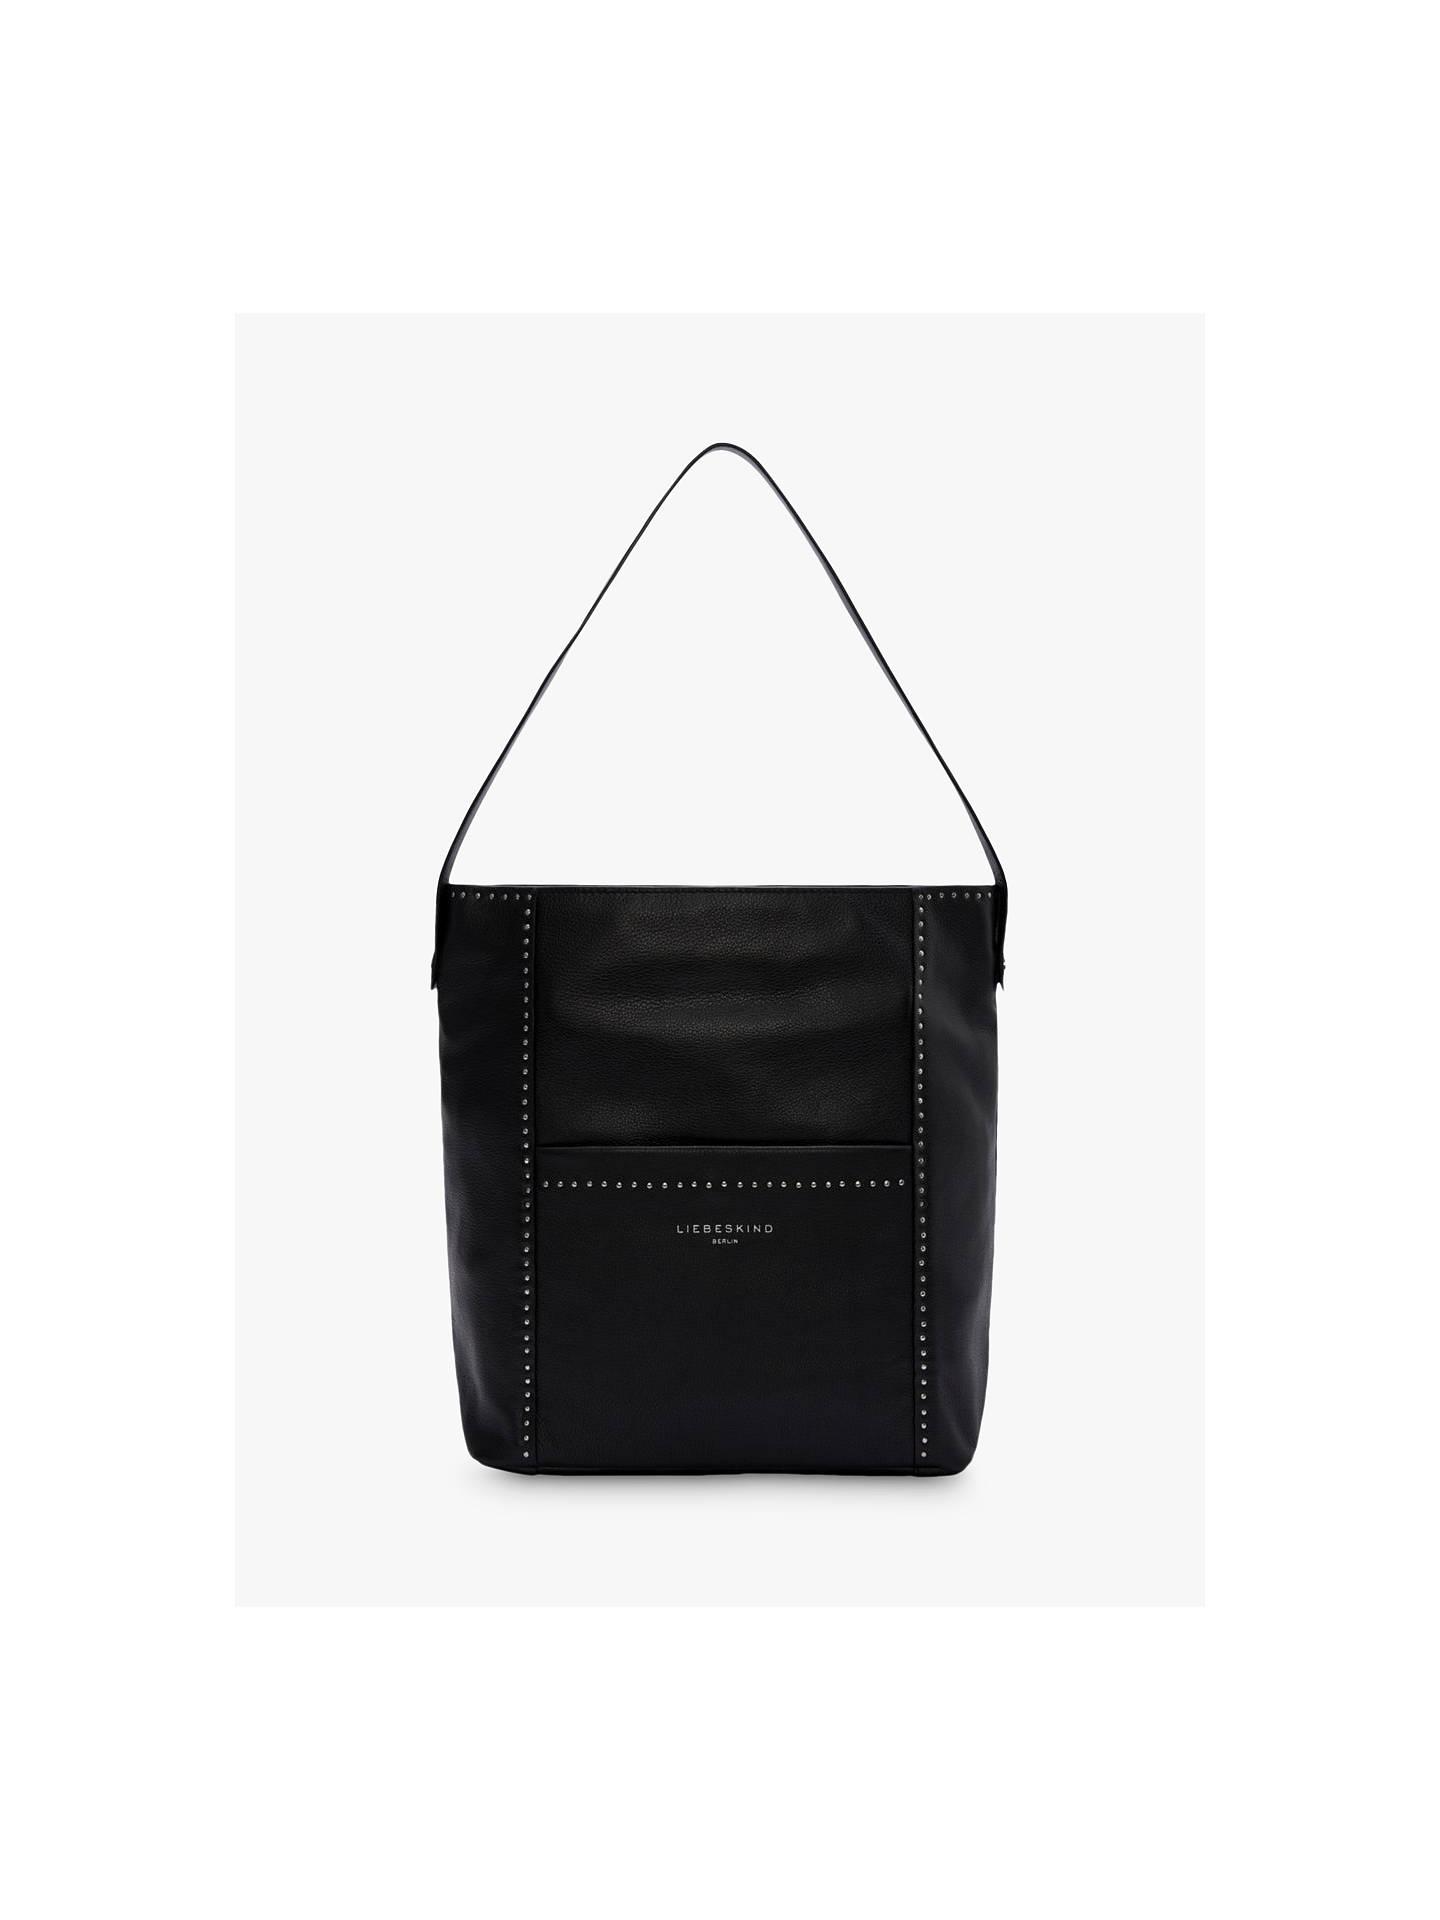 cd789c800b63 BuyLiebeskind Berlin Stud Love Leather Medium Hobo Bag